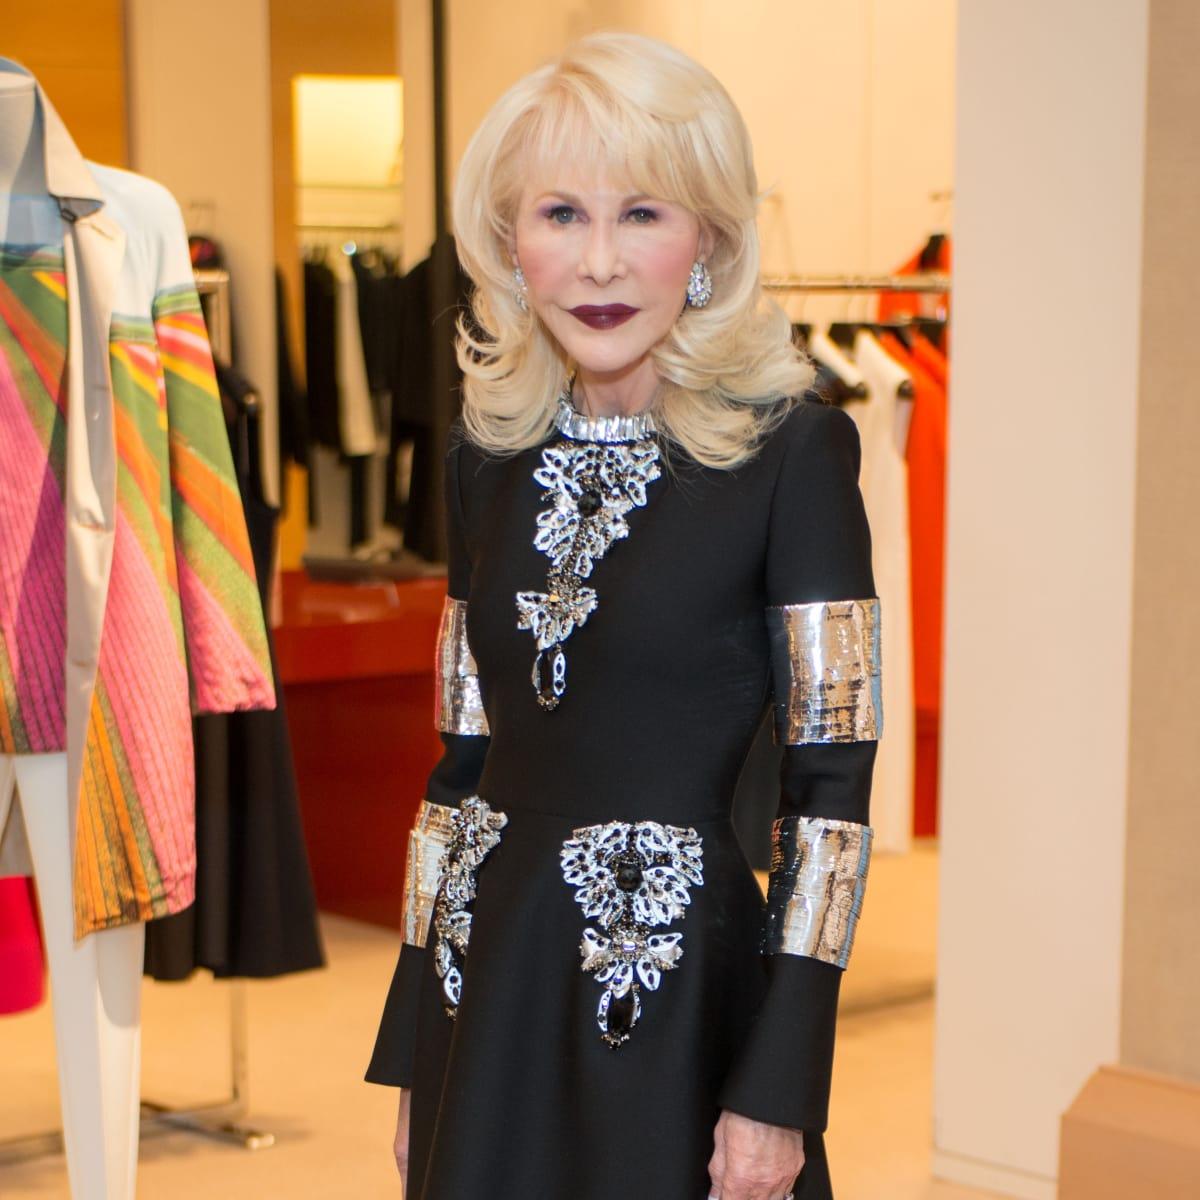 Best Dressed, Jan. 2016, Diane Lokey Farb